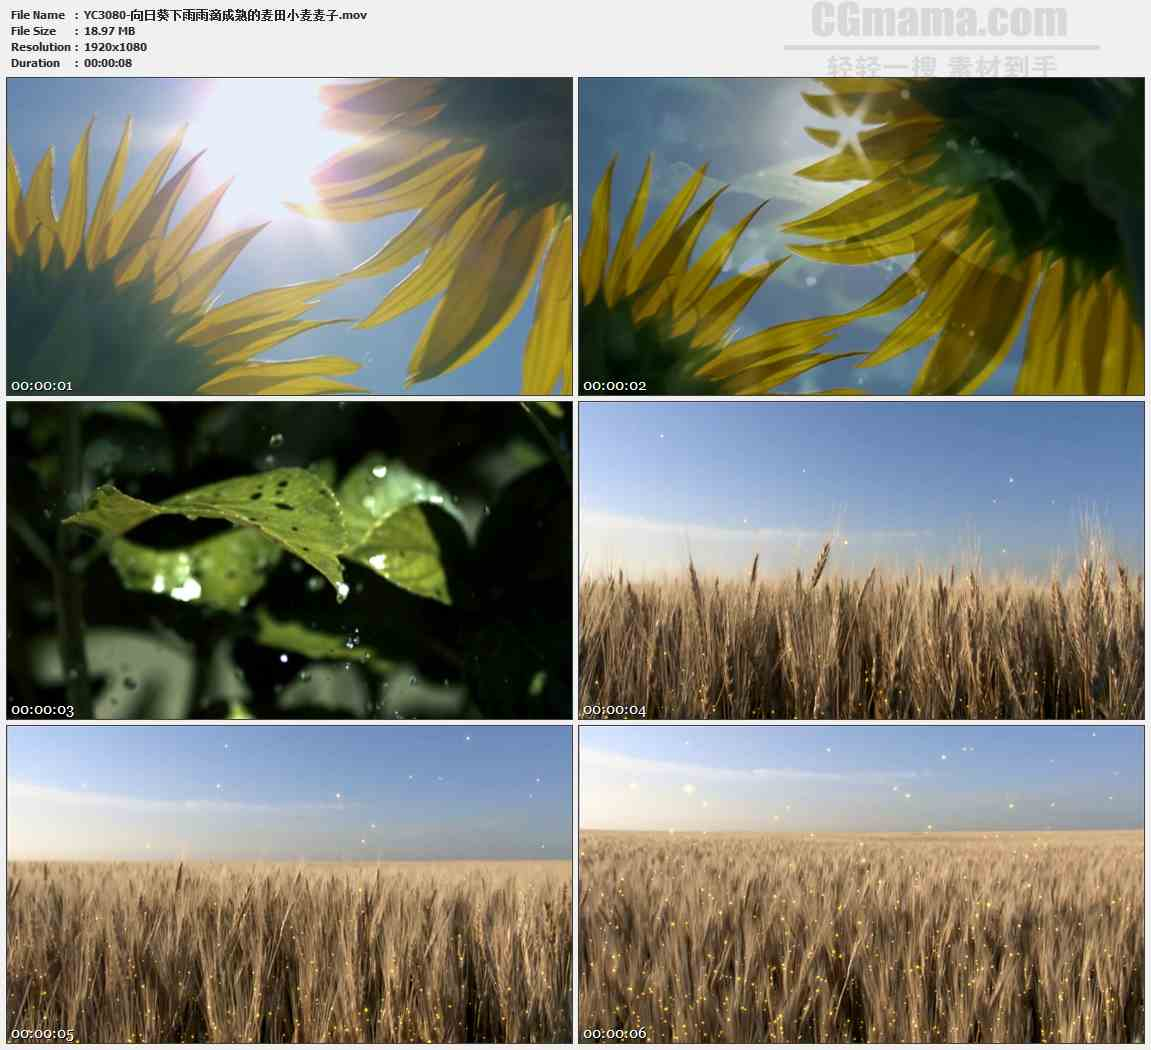 YC3080-向日葵下雨雨滴成熟的麦田小麦麦子高清实拍视频素材